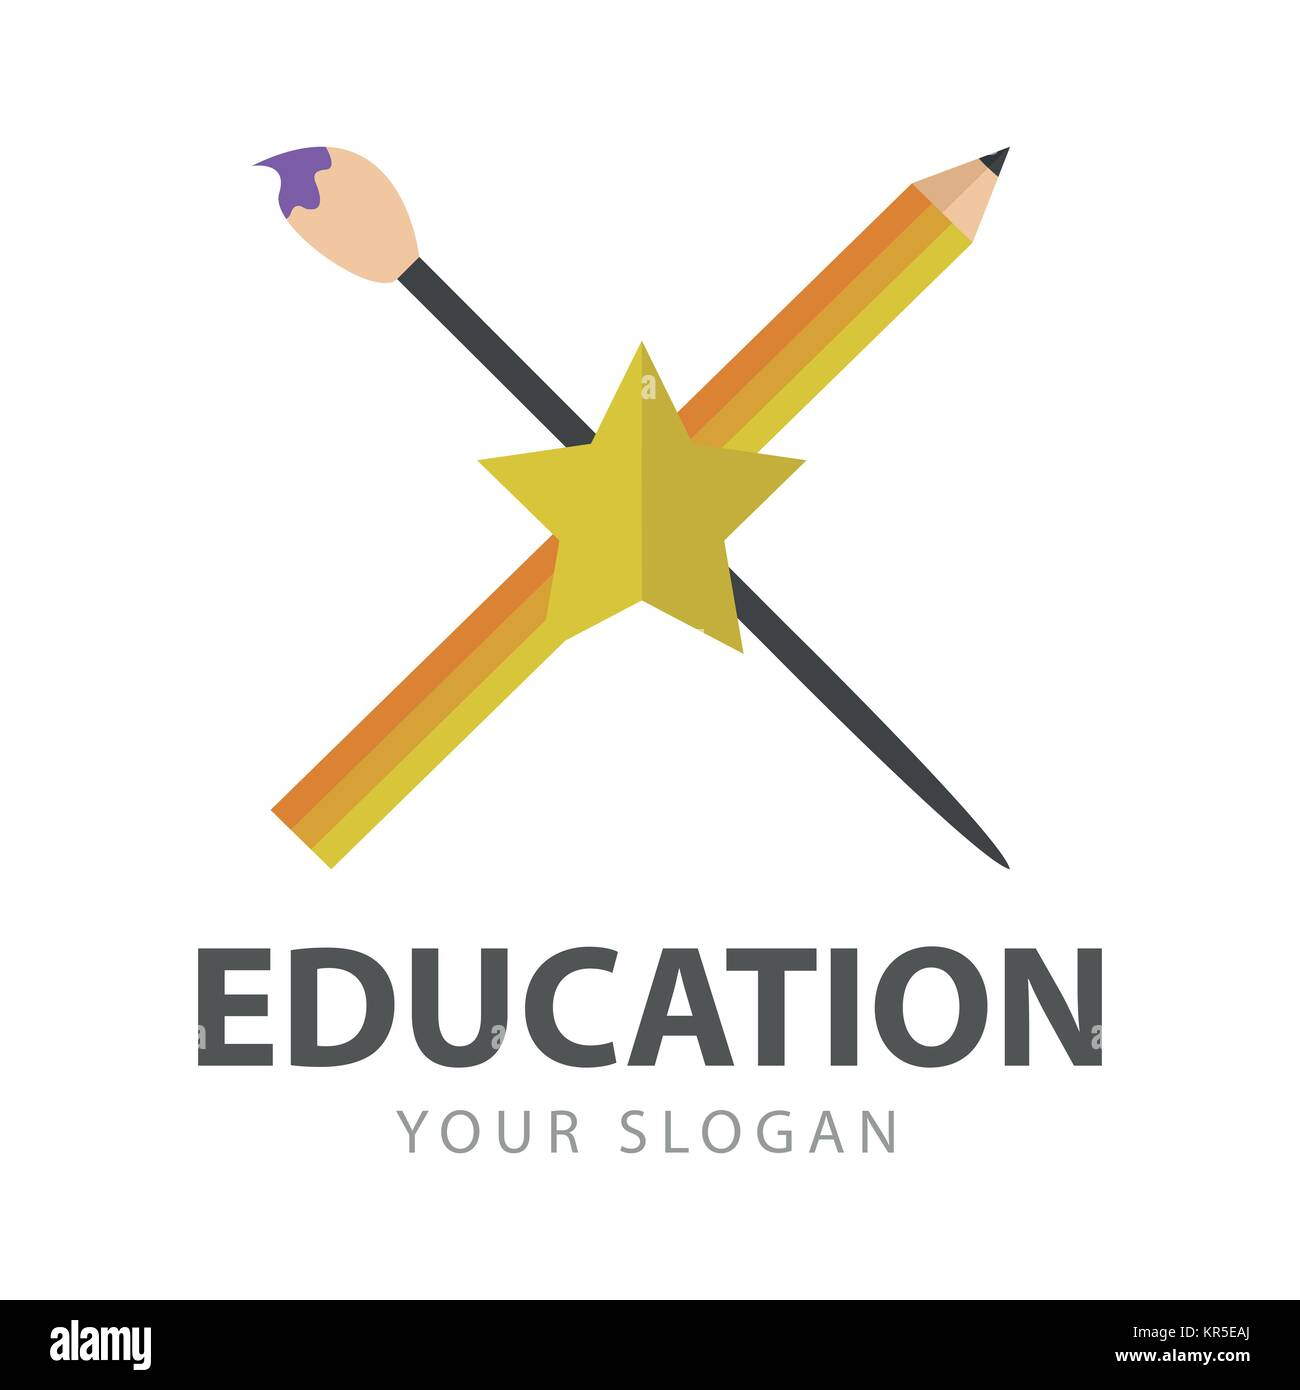 Education Art School Logo Vector Illustration Graphic Design - Stock Image